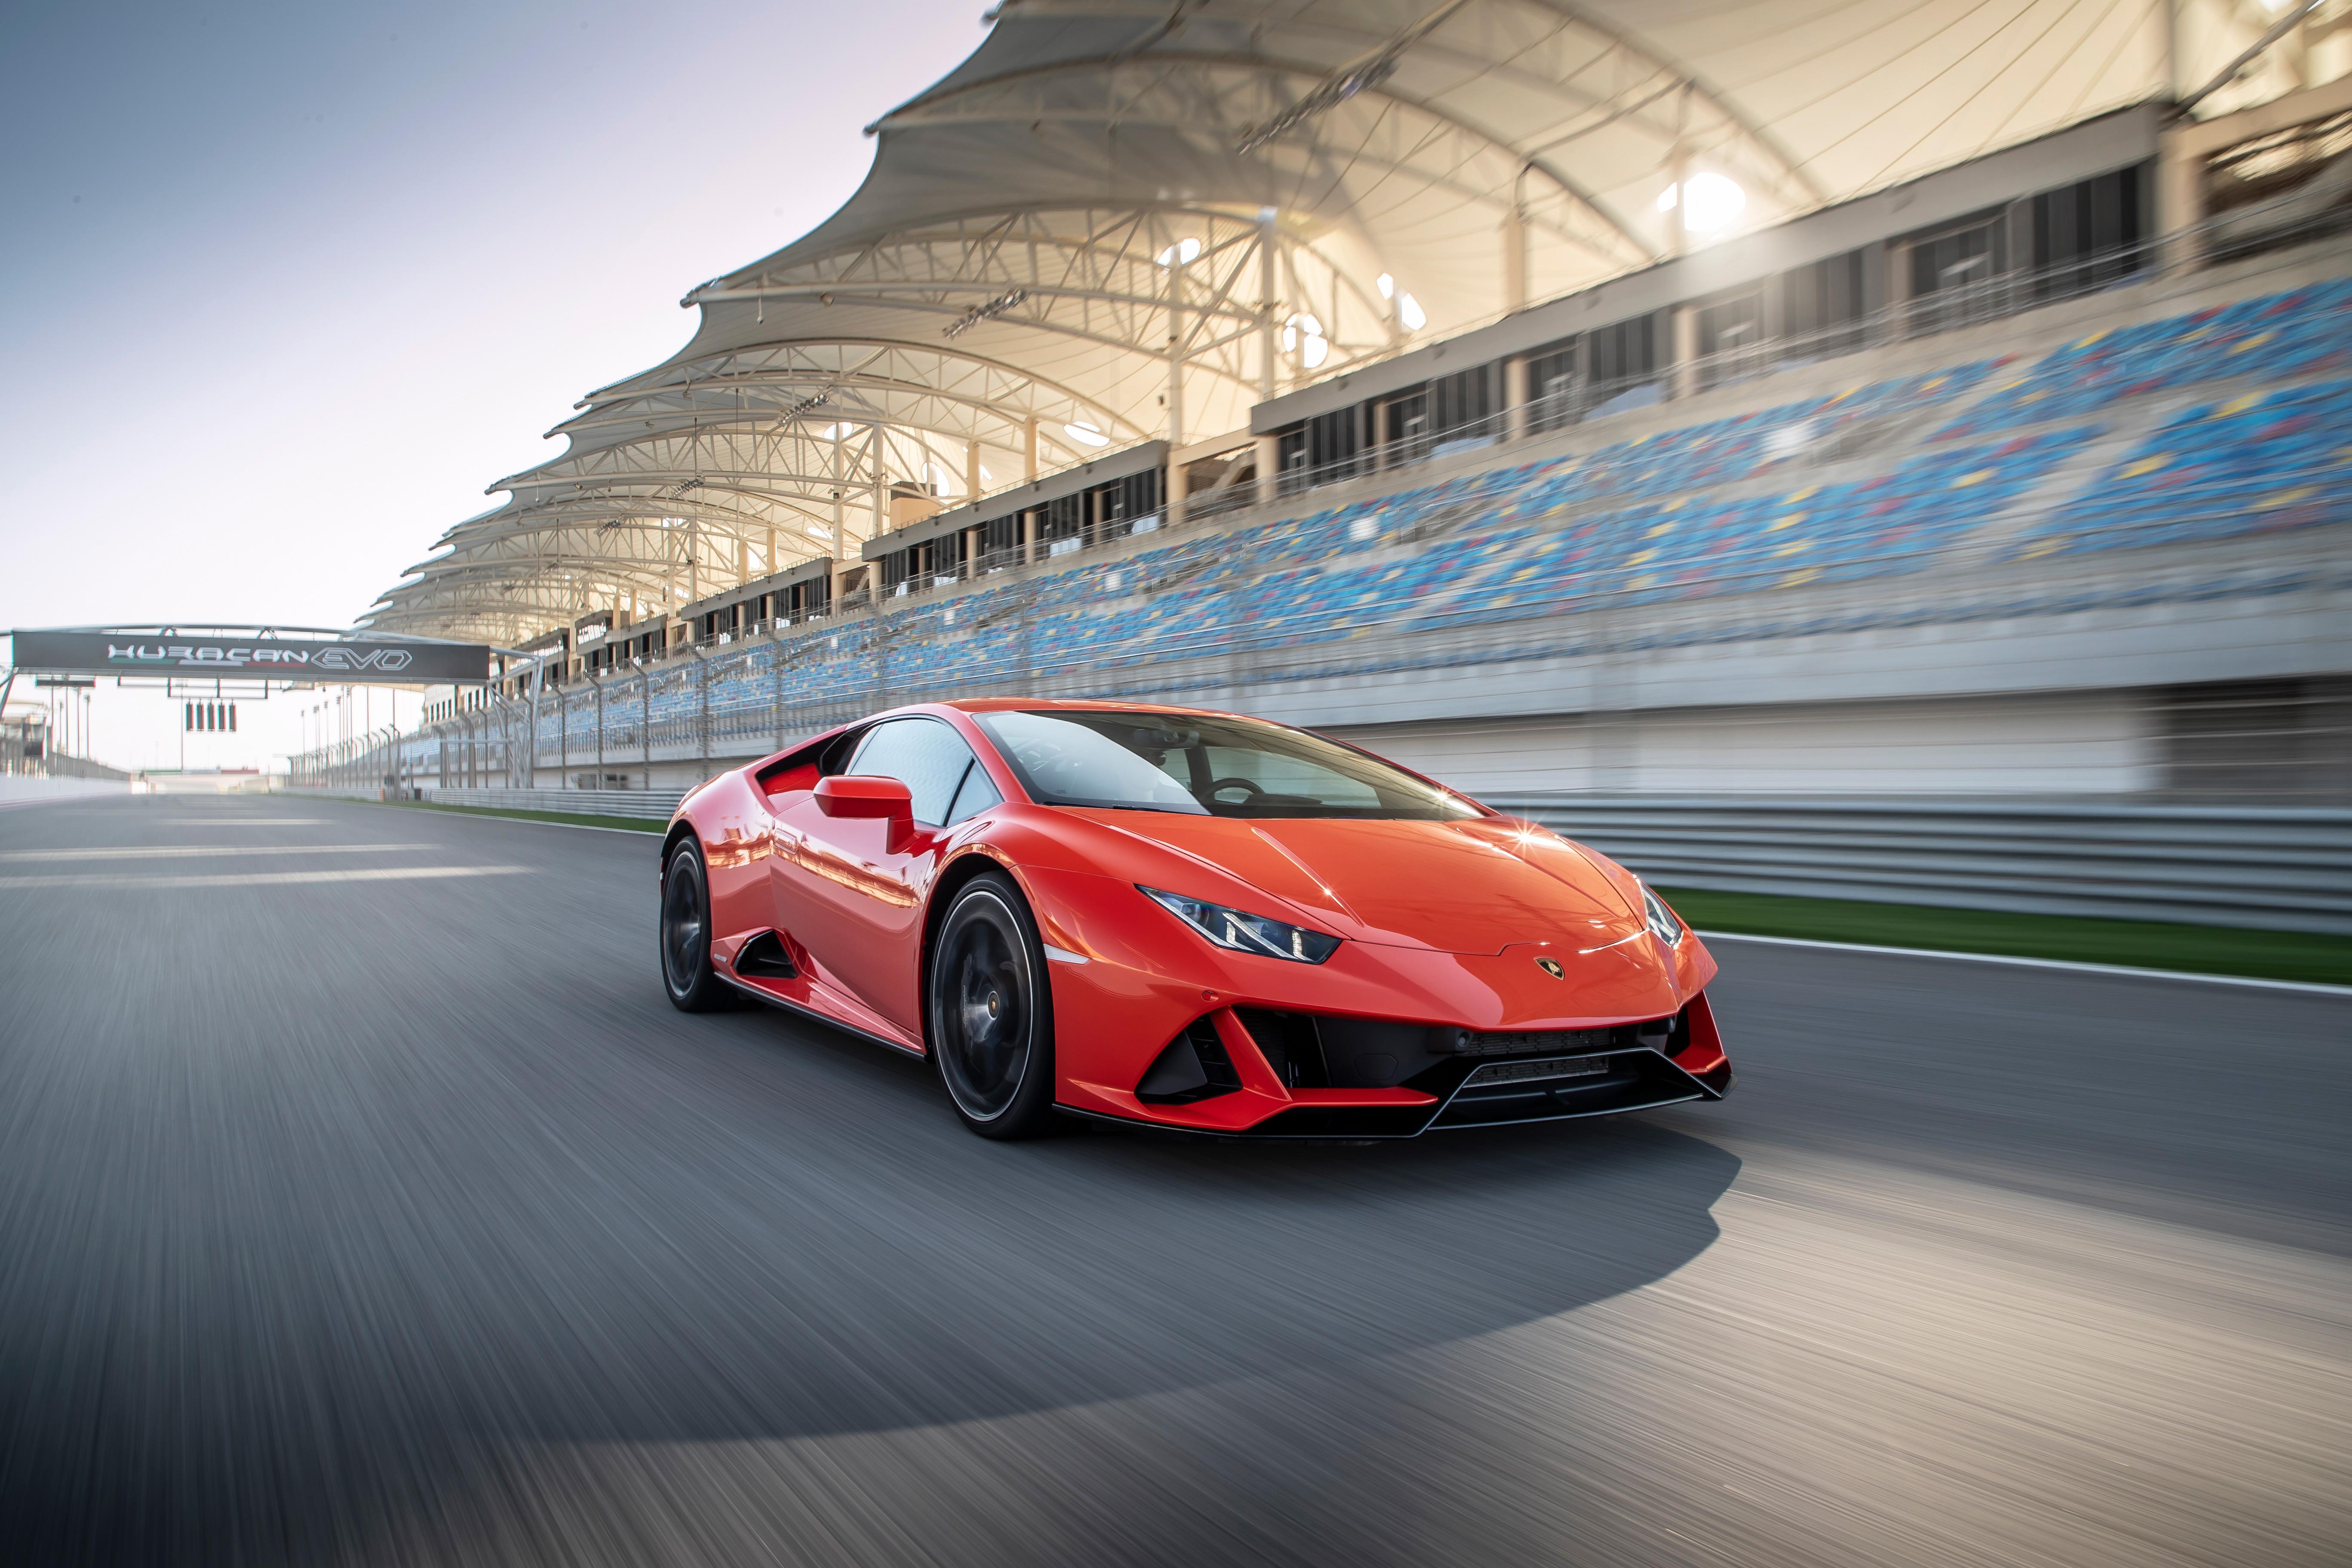 2019 Lamborghini Huracan EVO 4k, HD Cars, 4k Wallpapers ...